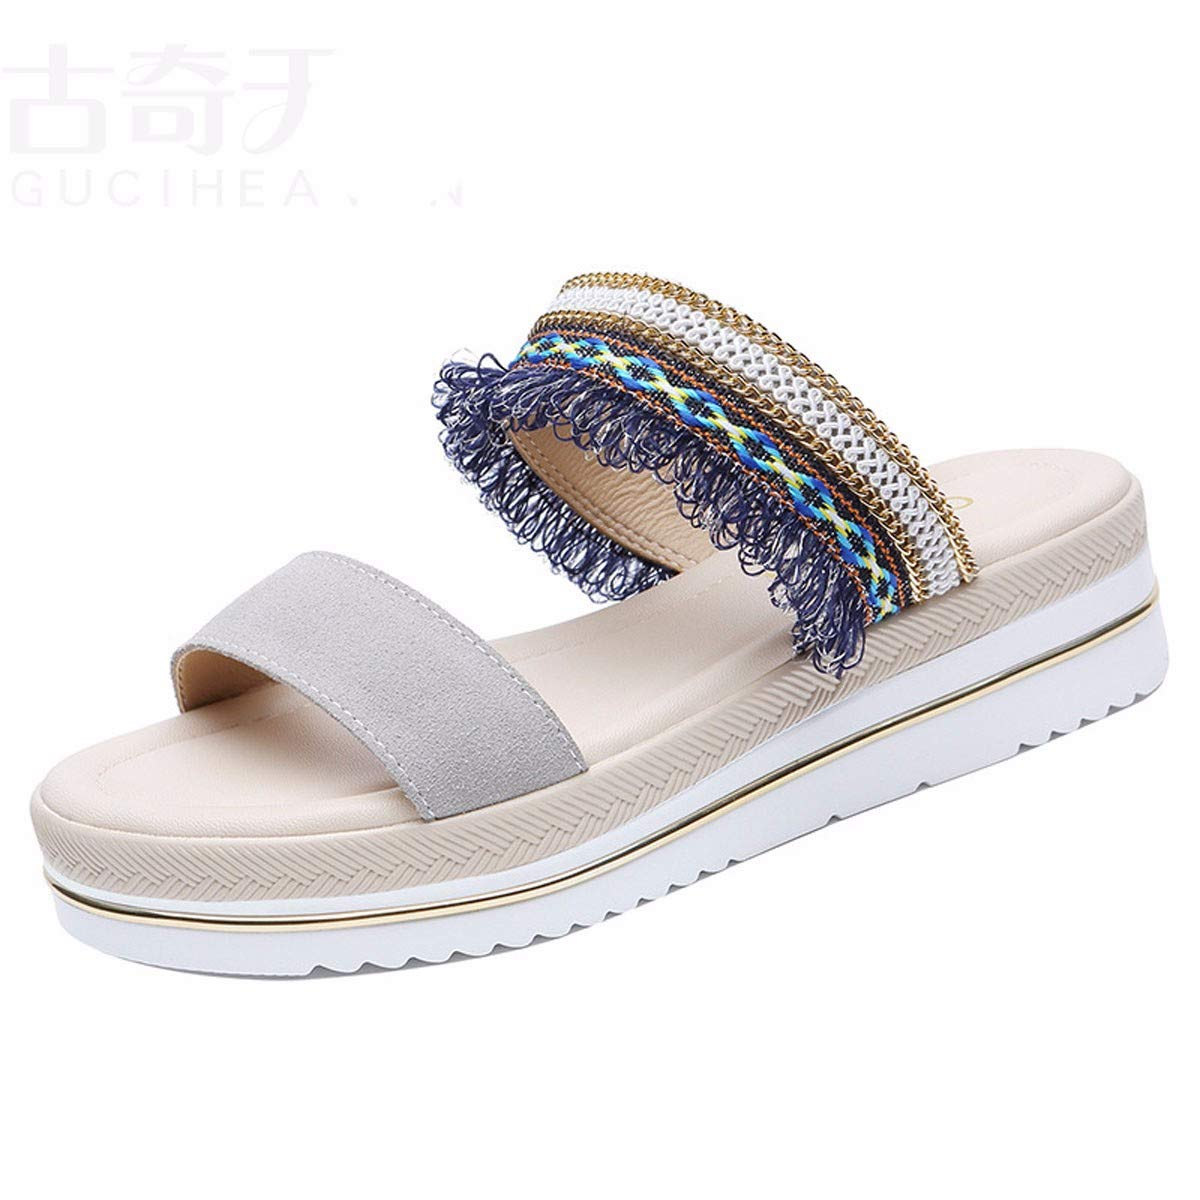 GTVERNH Frauen Schuhe Mode Für Frauen Schuhe Leder Damen - Sandalen Sommer Dicke Hintern Schuhe Mode Tragen